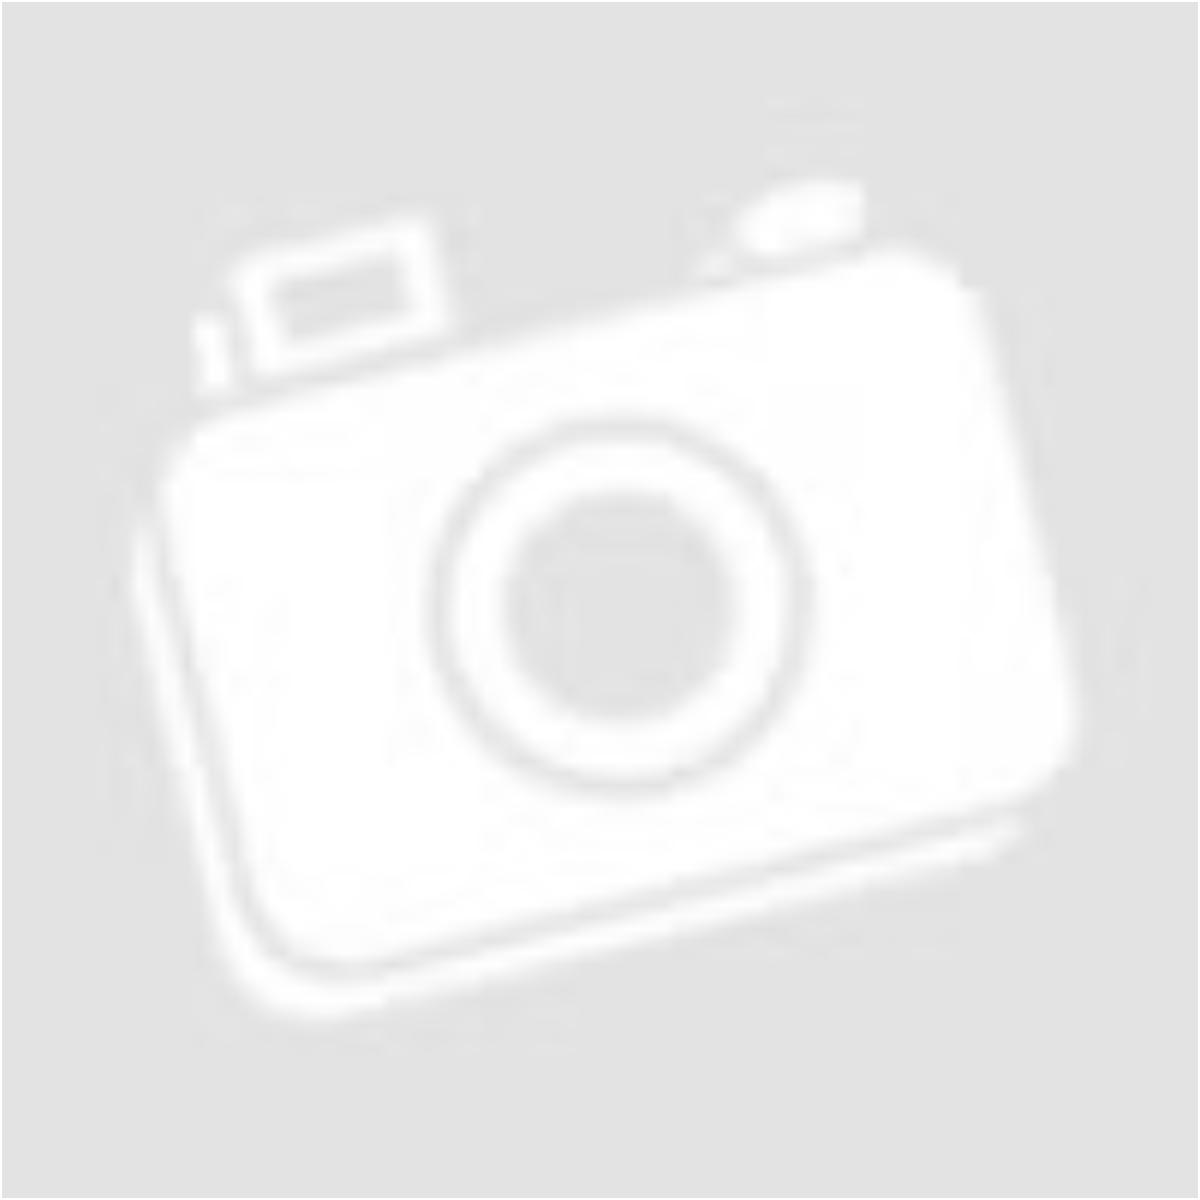 BIANCHI T-TRONIK SPORT 9.2 - ALTUS 9SP kerékpár